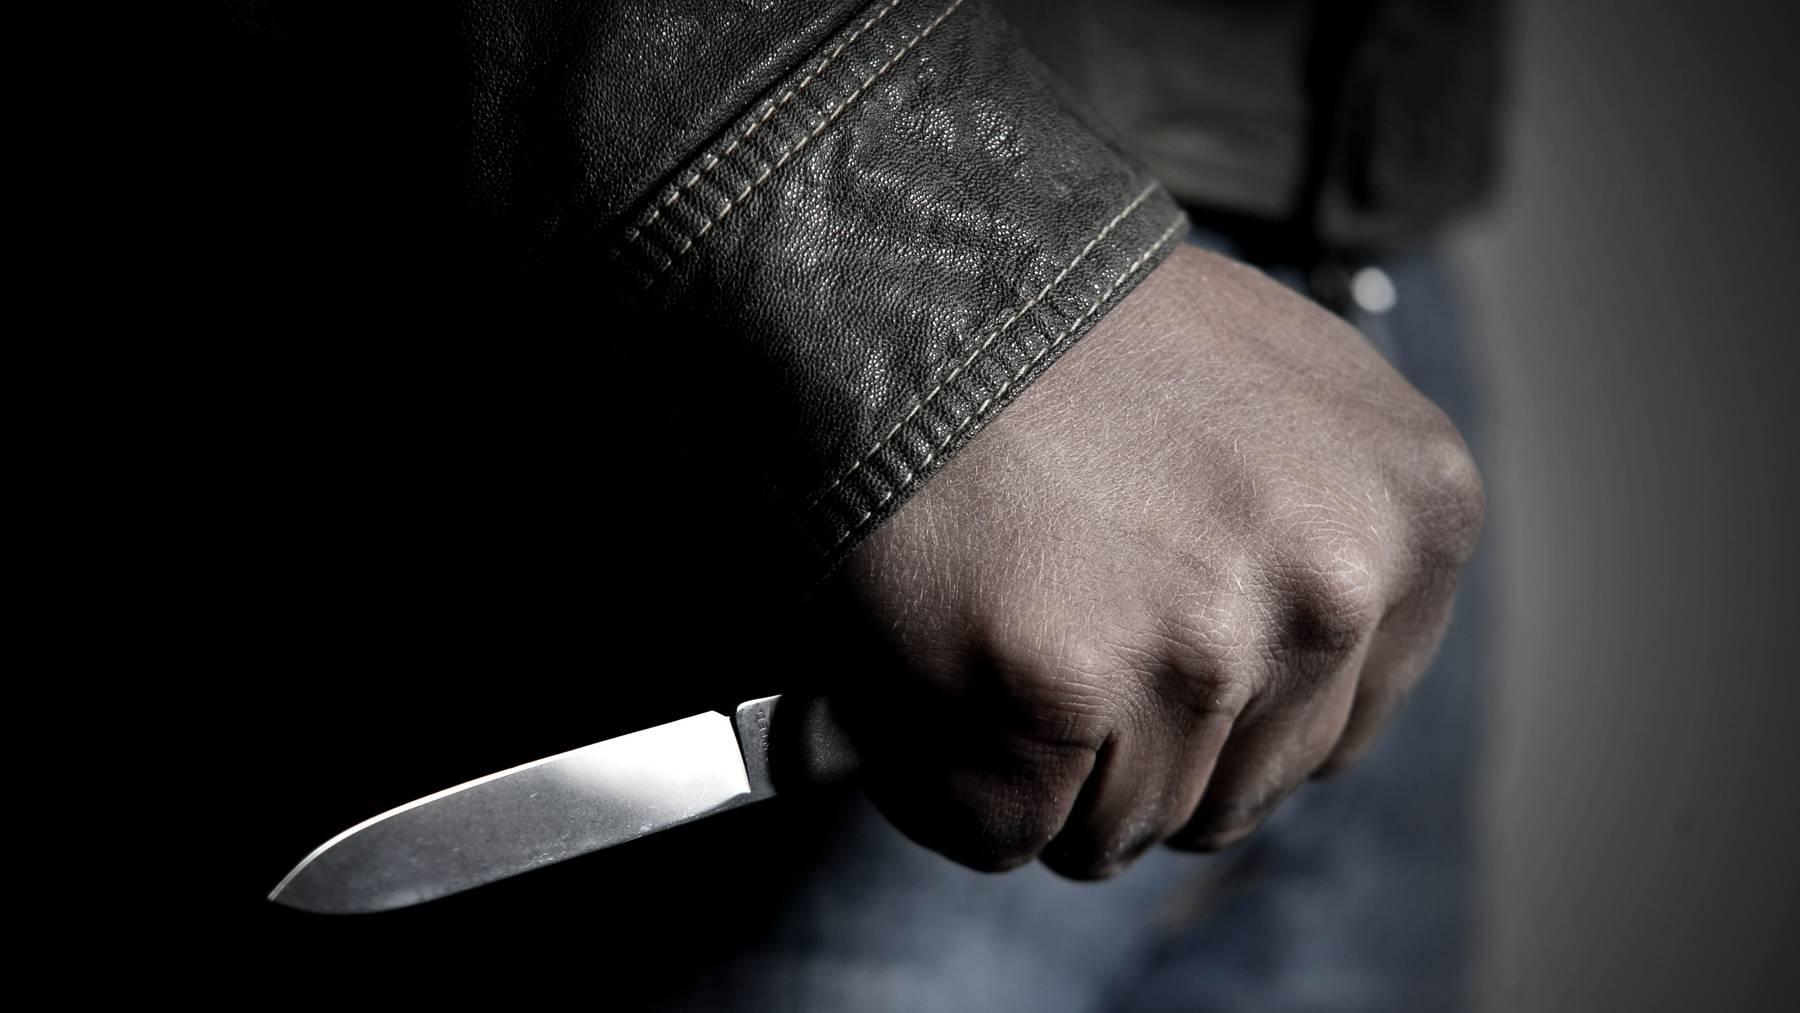 Luzern: Schüler will Lehrer töten